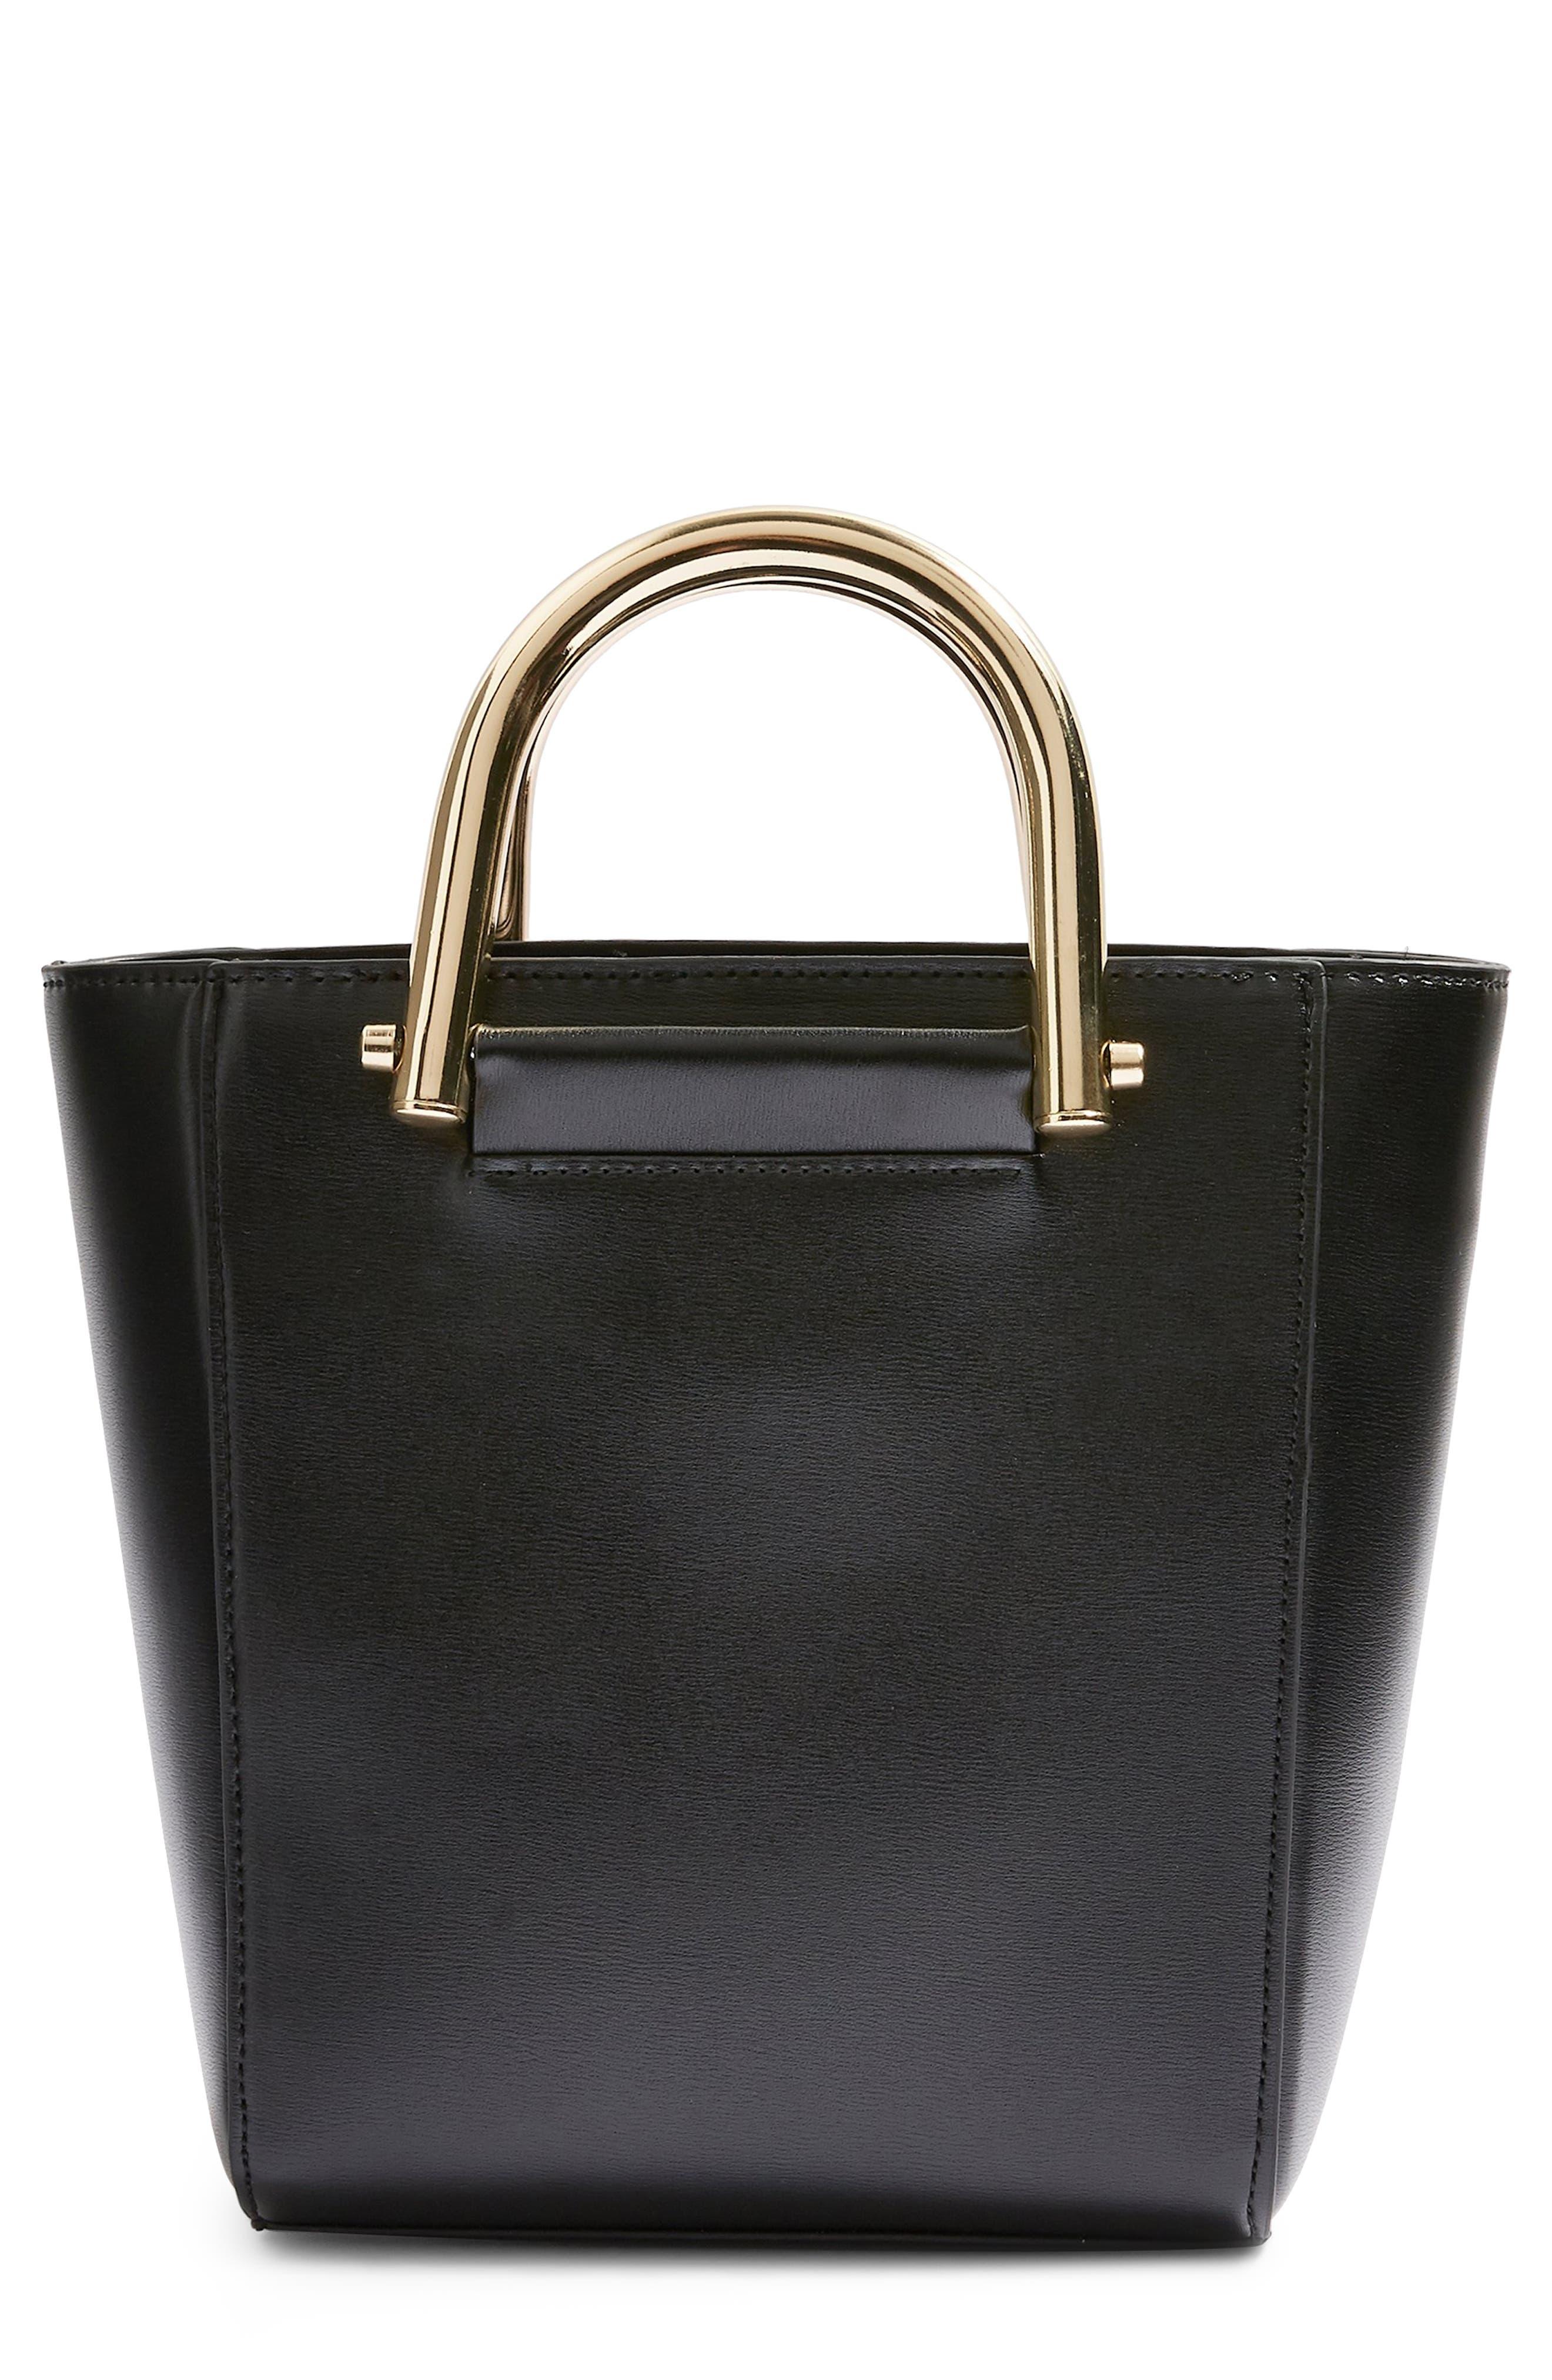 TOPSHOP,                             Lacey Metal Top Handle Shoulder Bag,                             Main thumbnail 1, color,                             001